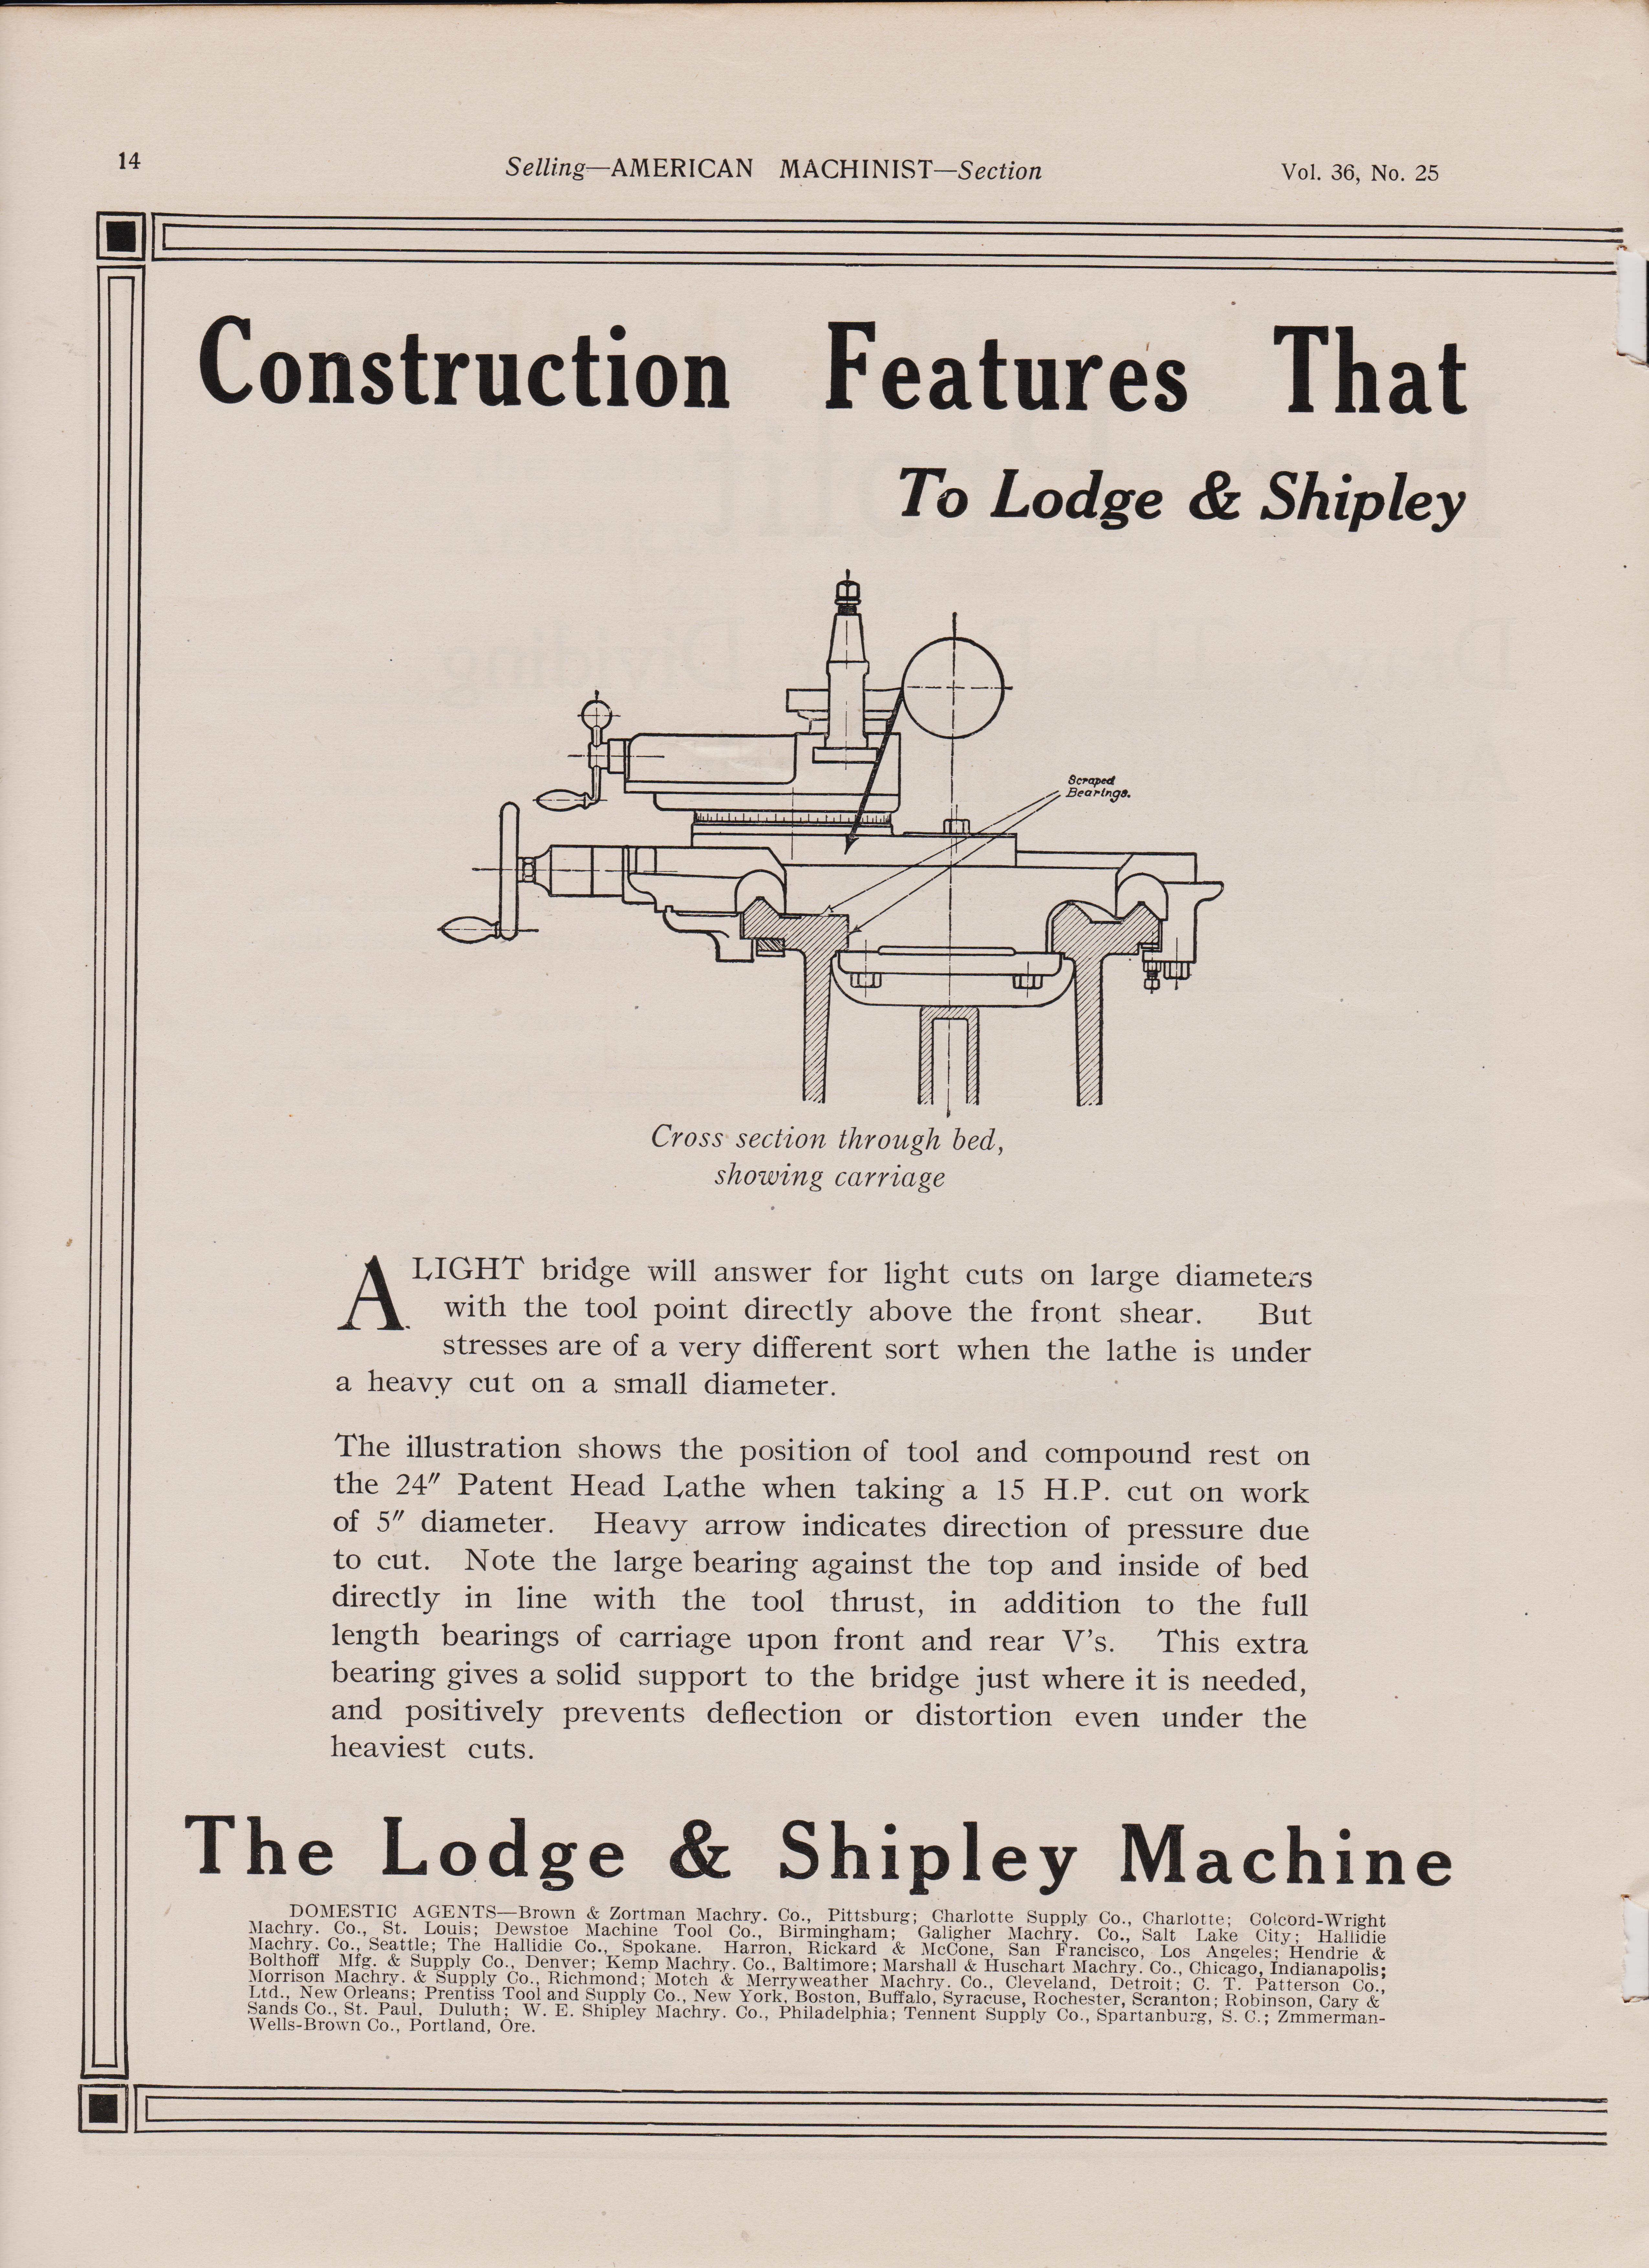 https://antiquemachinery.com/images-2021/1912-American-Machinist-Magazine-1912-June-30-pg-14-Jones-and-Lamson-Machine-Co-Flat-Turret-Lathe.jpeg